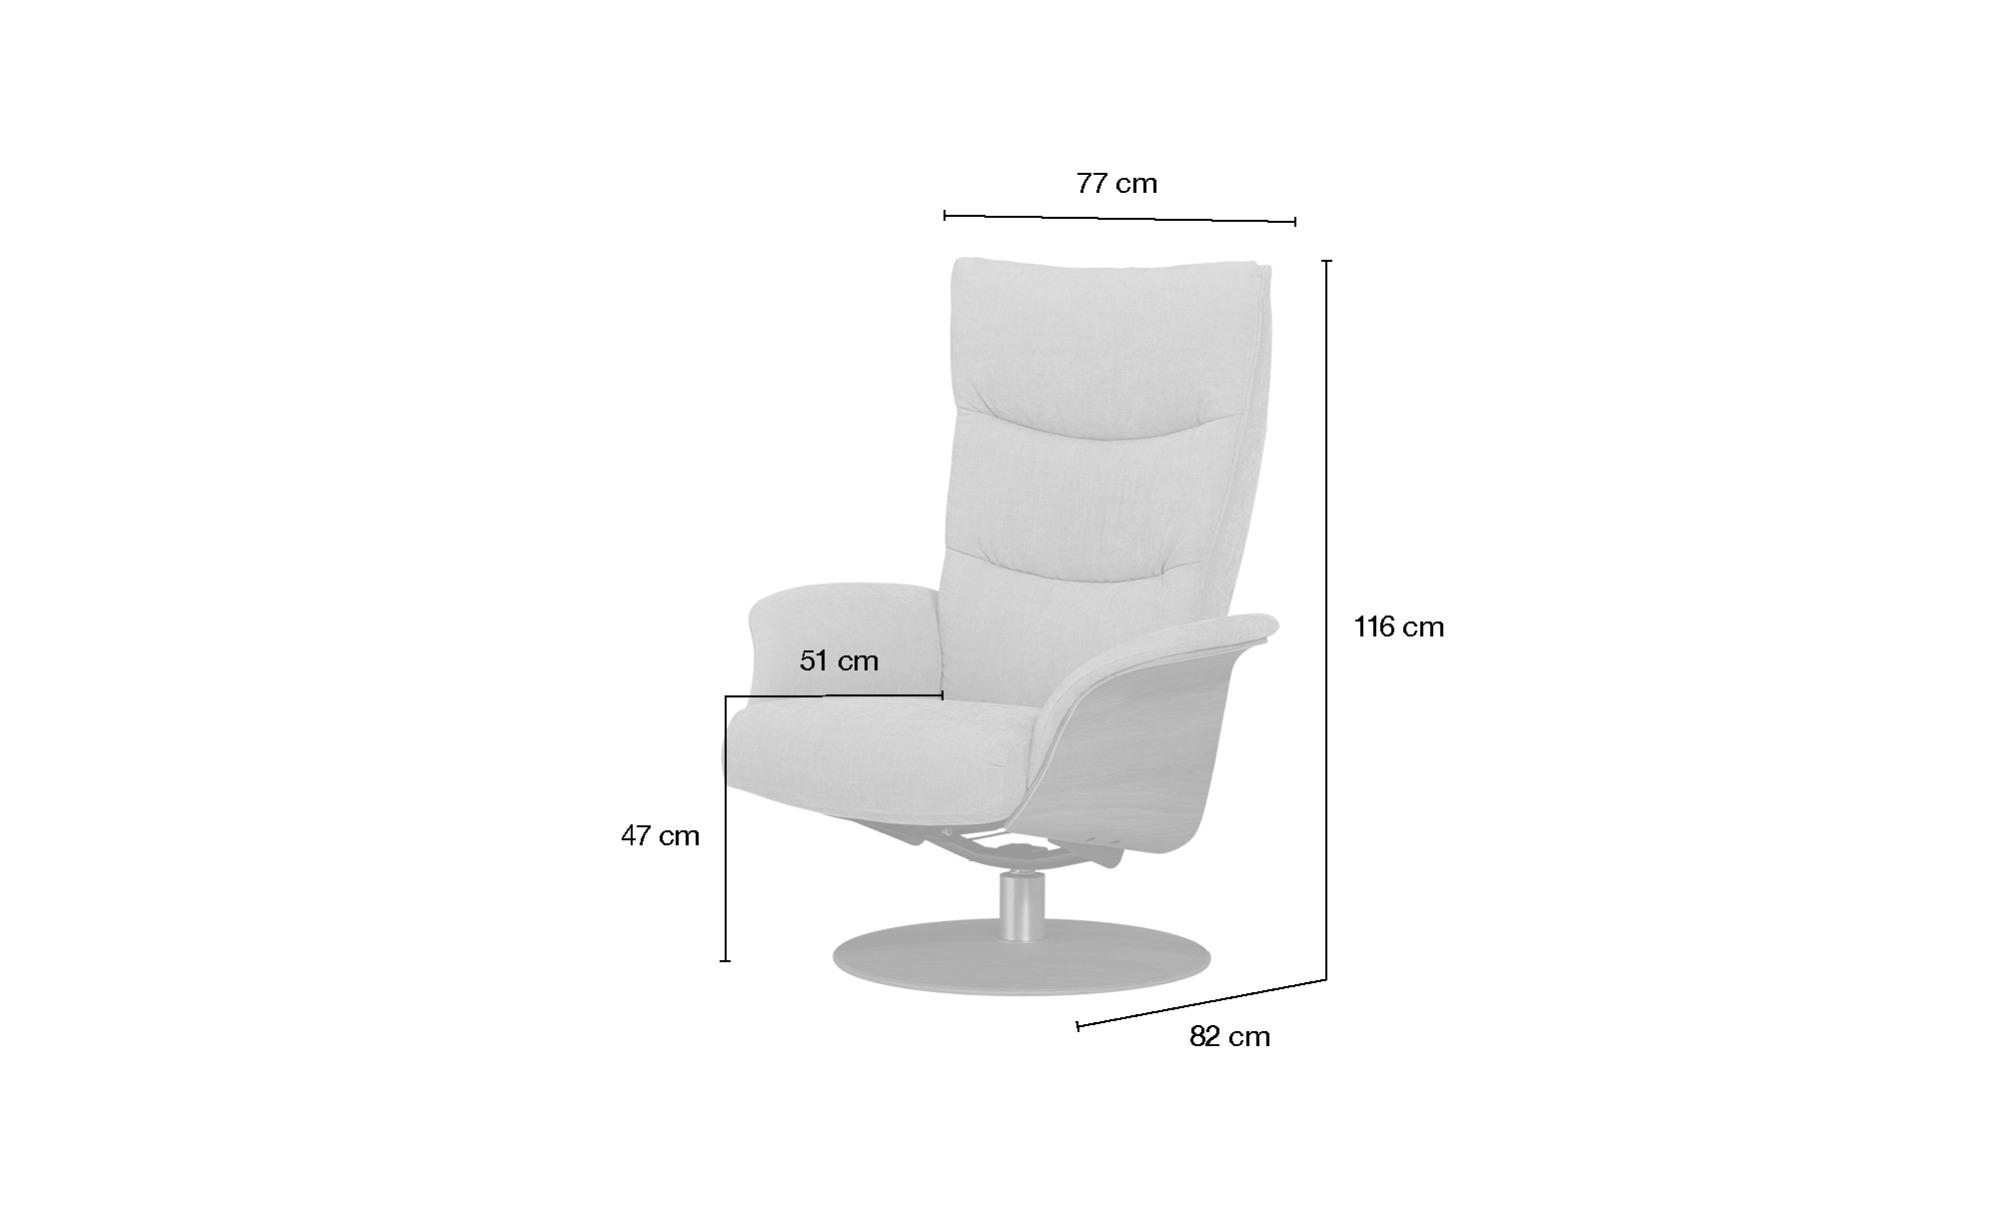 Relaxsessel  Stian ¦ grün ¦ Maße (cm): B: 77 H: 116 T: 82 Polstermöbel > Sessel > Fernsehsessel - Höffner